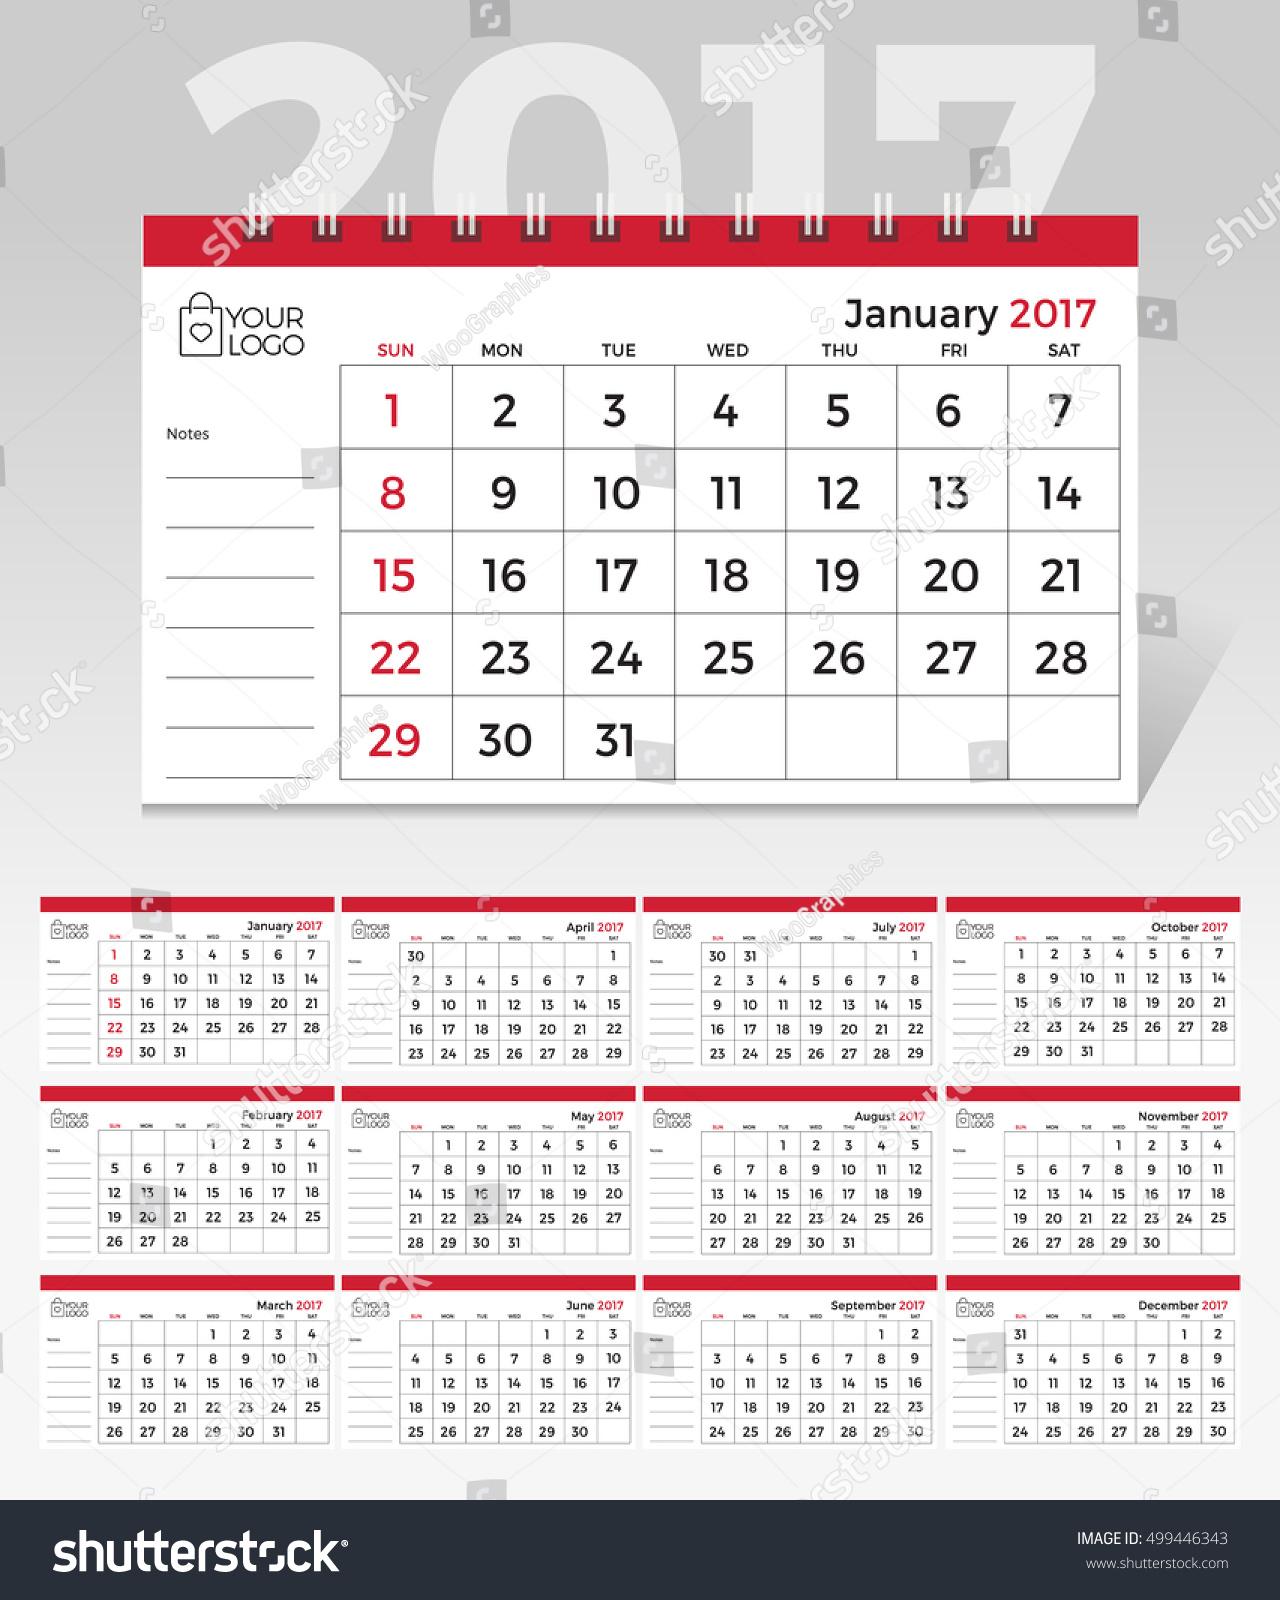 Elegant Desk Calendar Design : Desk calendar simple minimal elegant stock vector